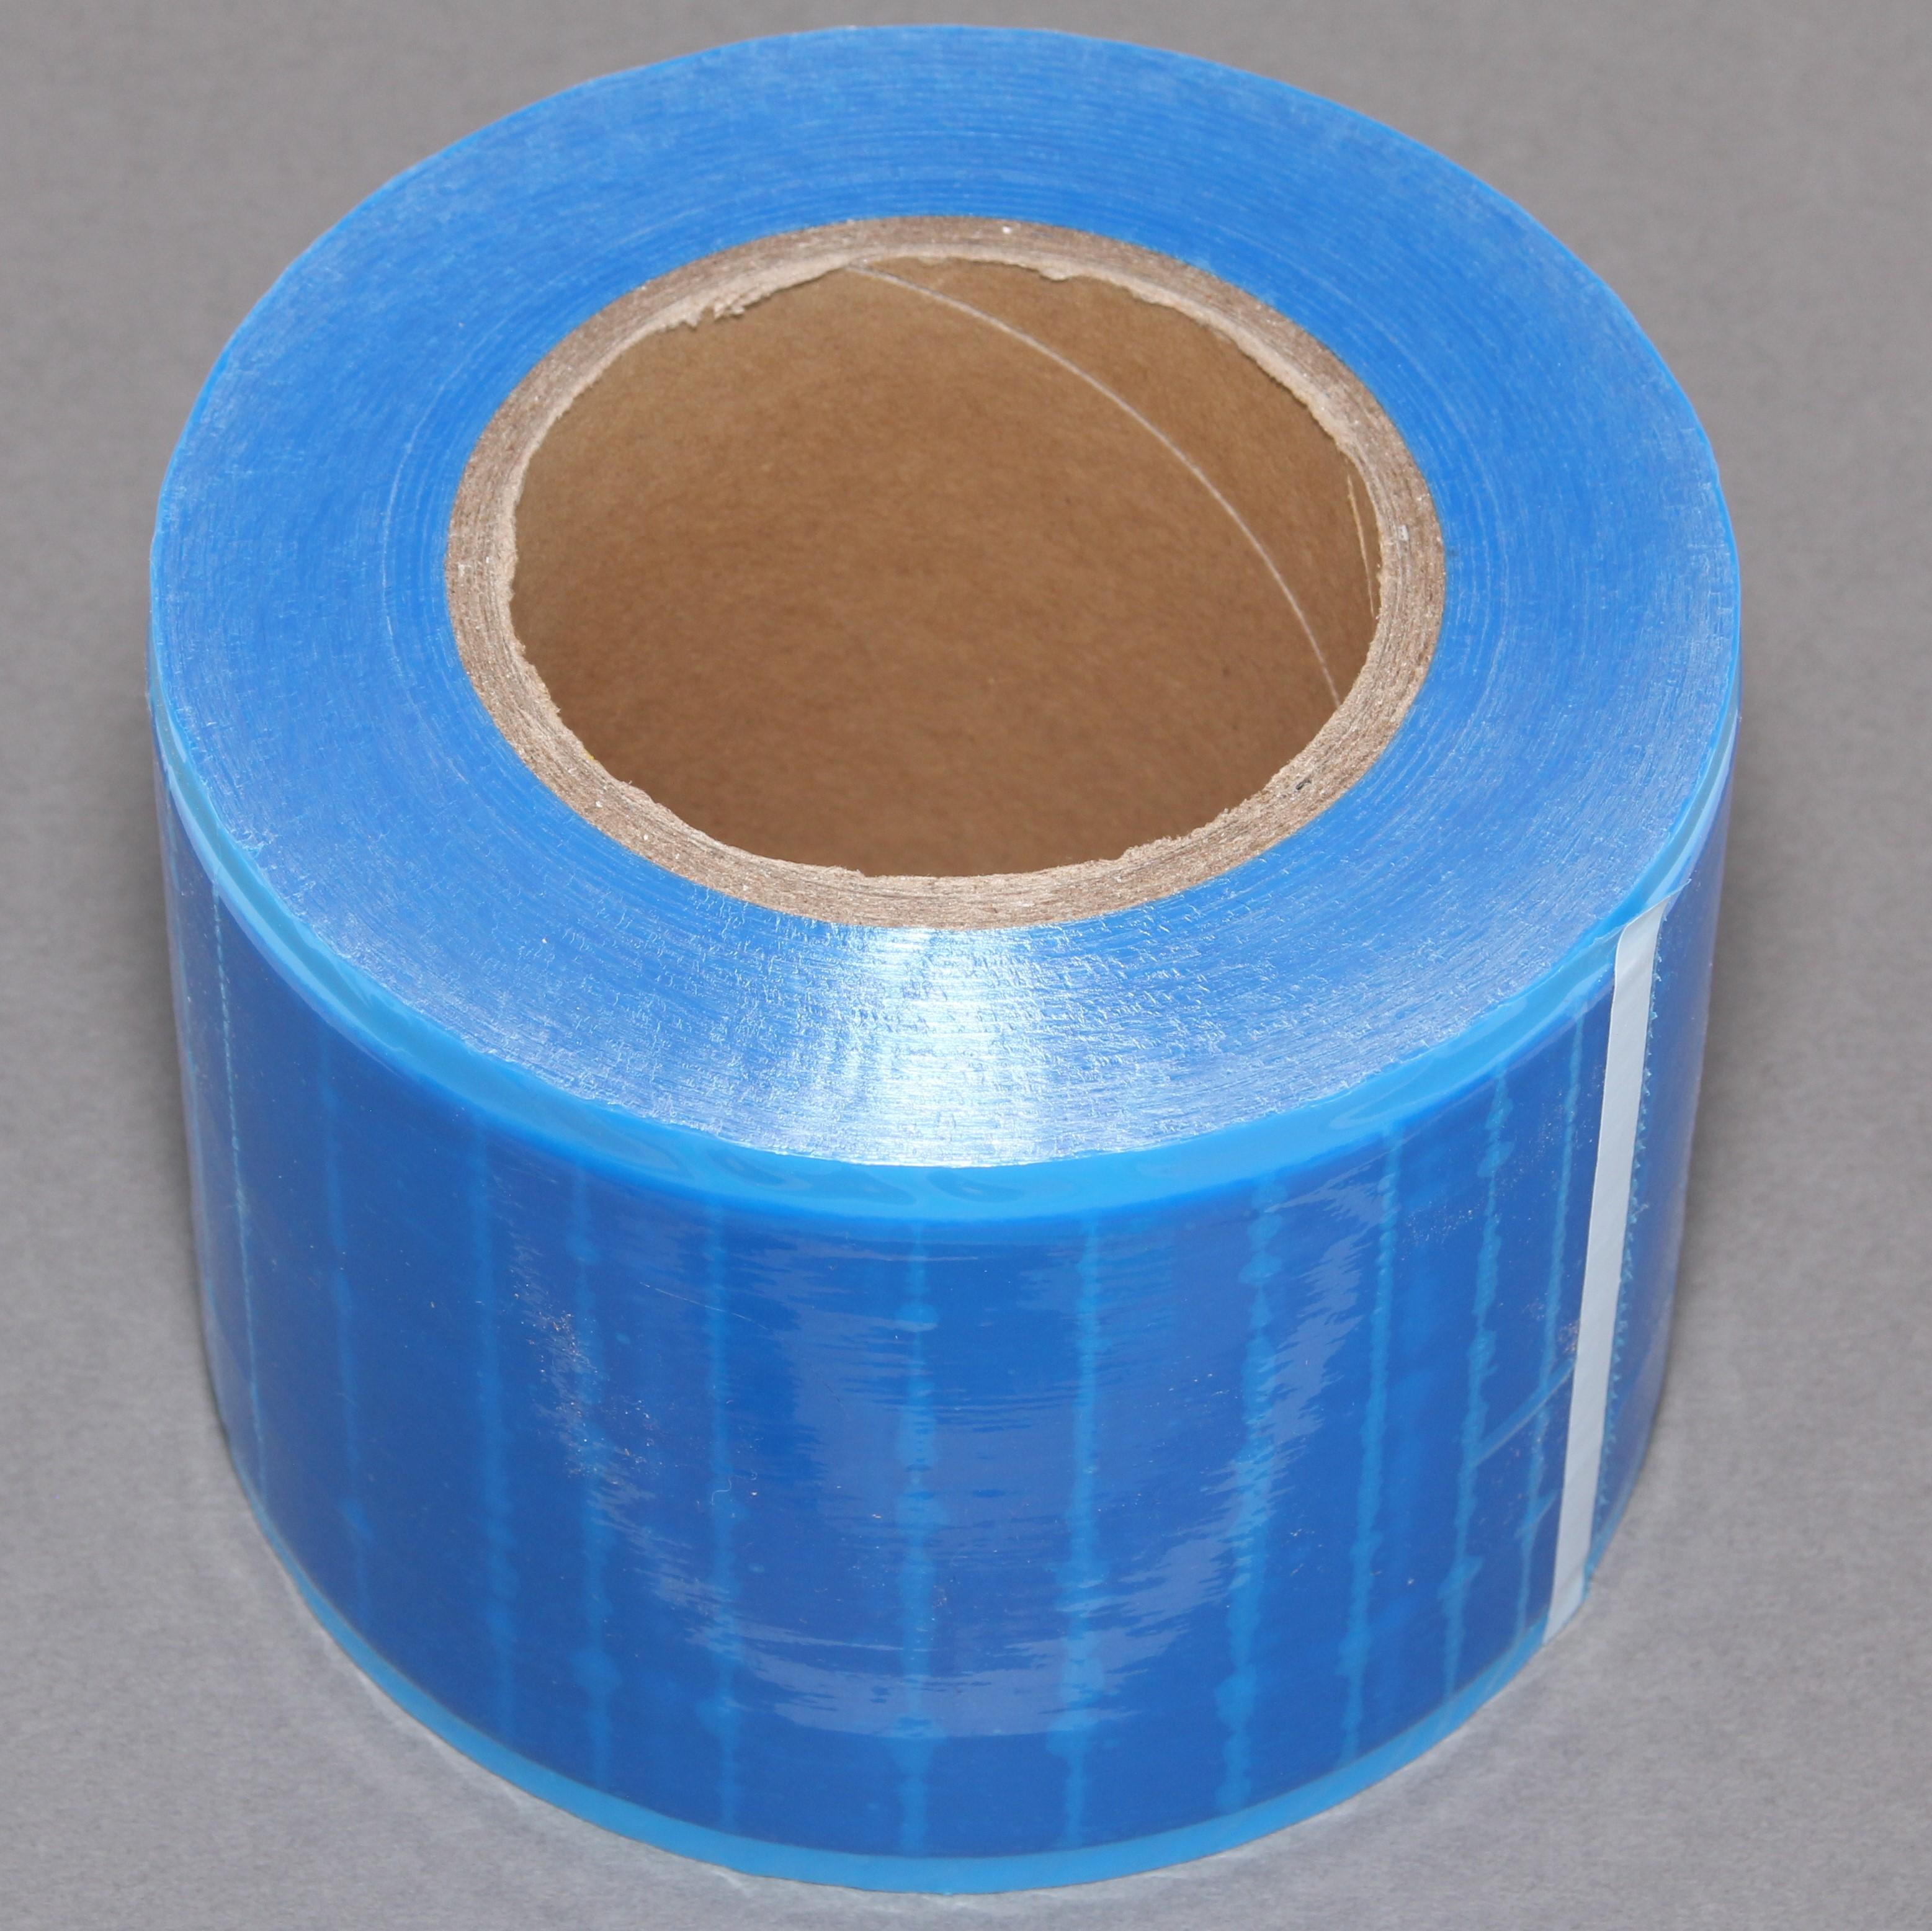 Barrier Film, Non-Stick Edge Paper Core, 1200 Sheets